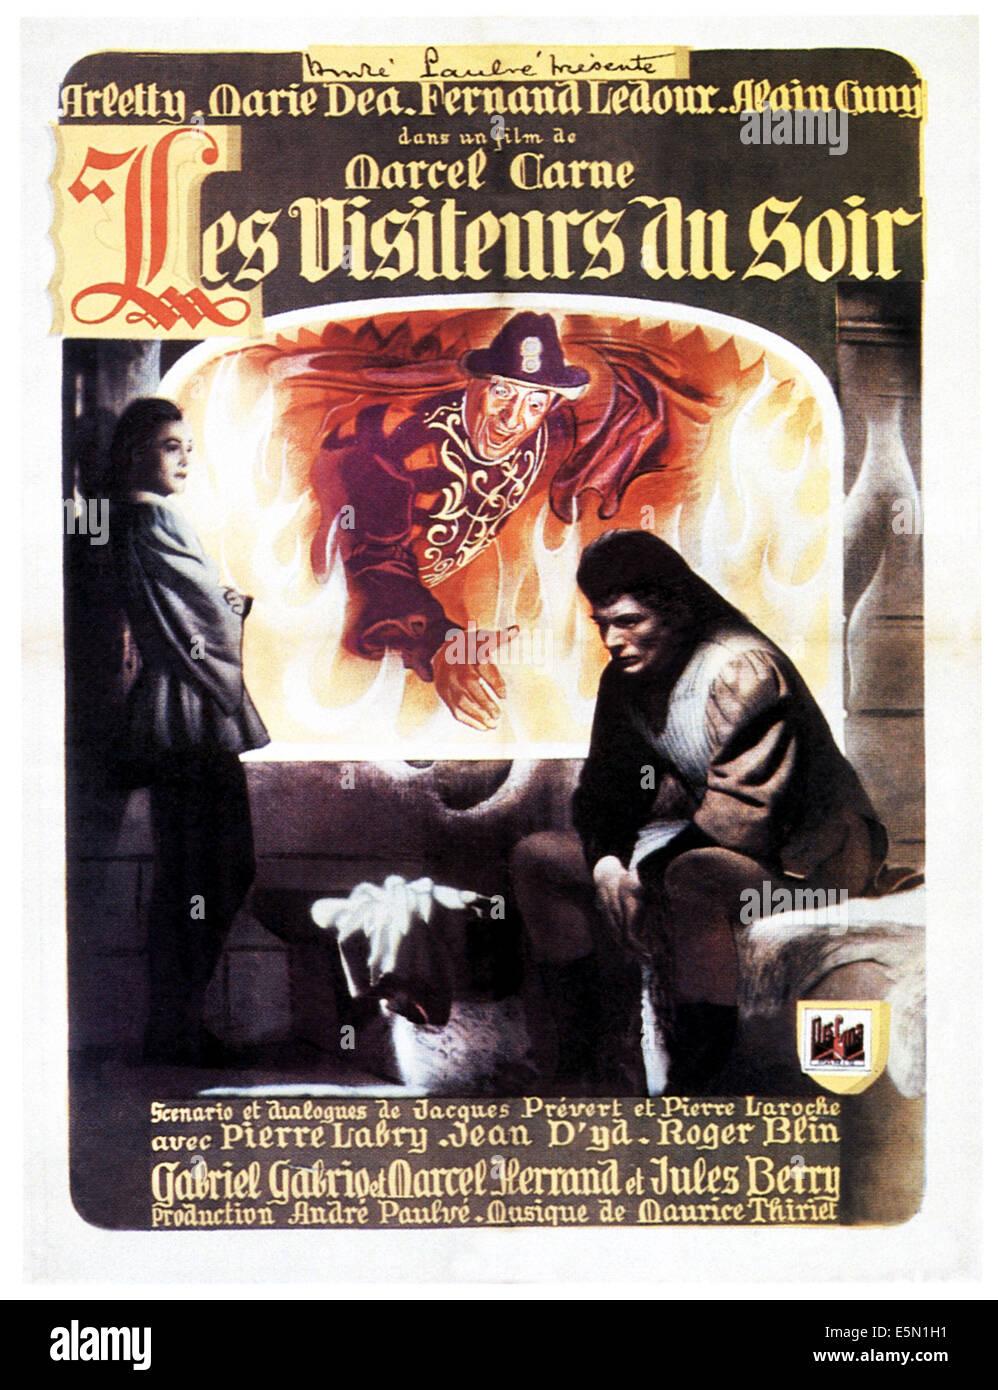 LE VISITEURS DU SOIR, French poster art, 1943. - Stock Image